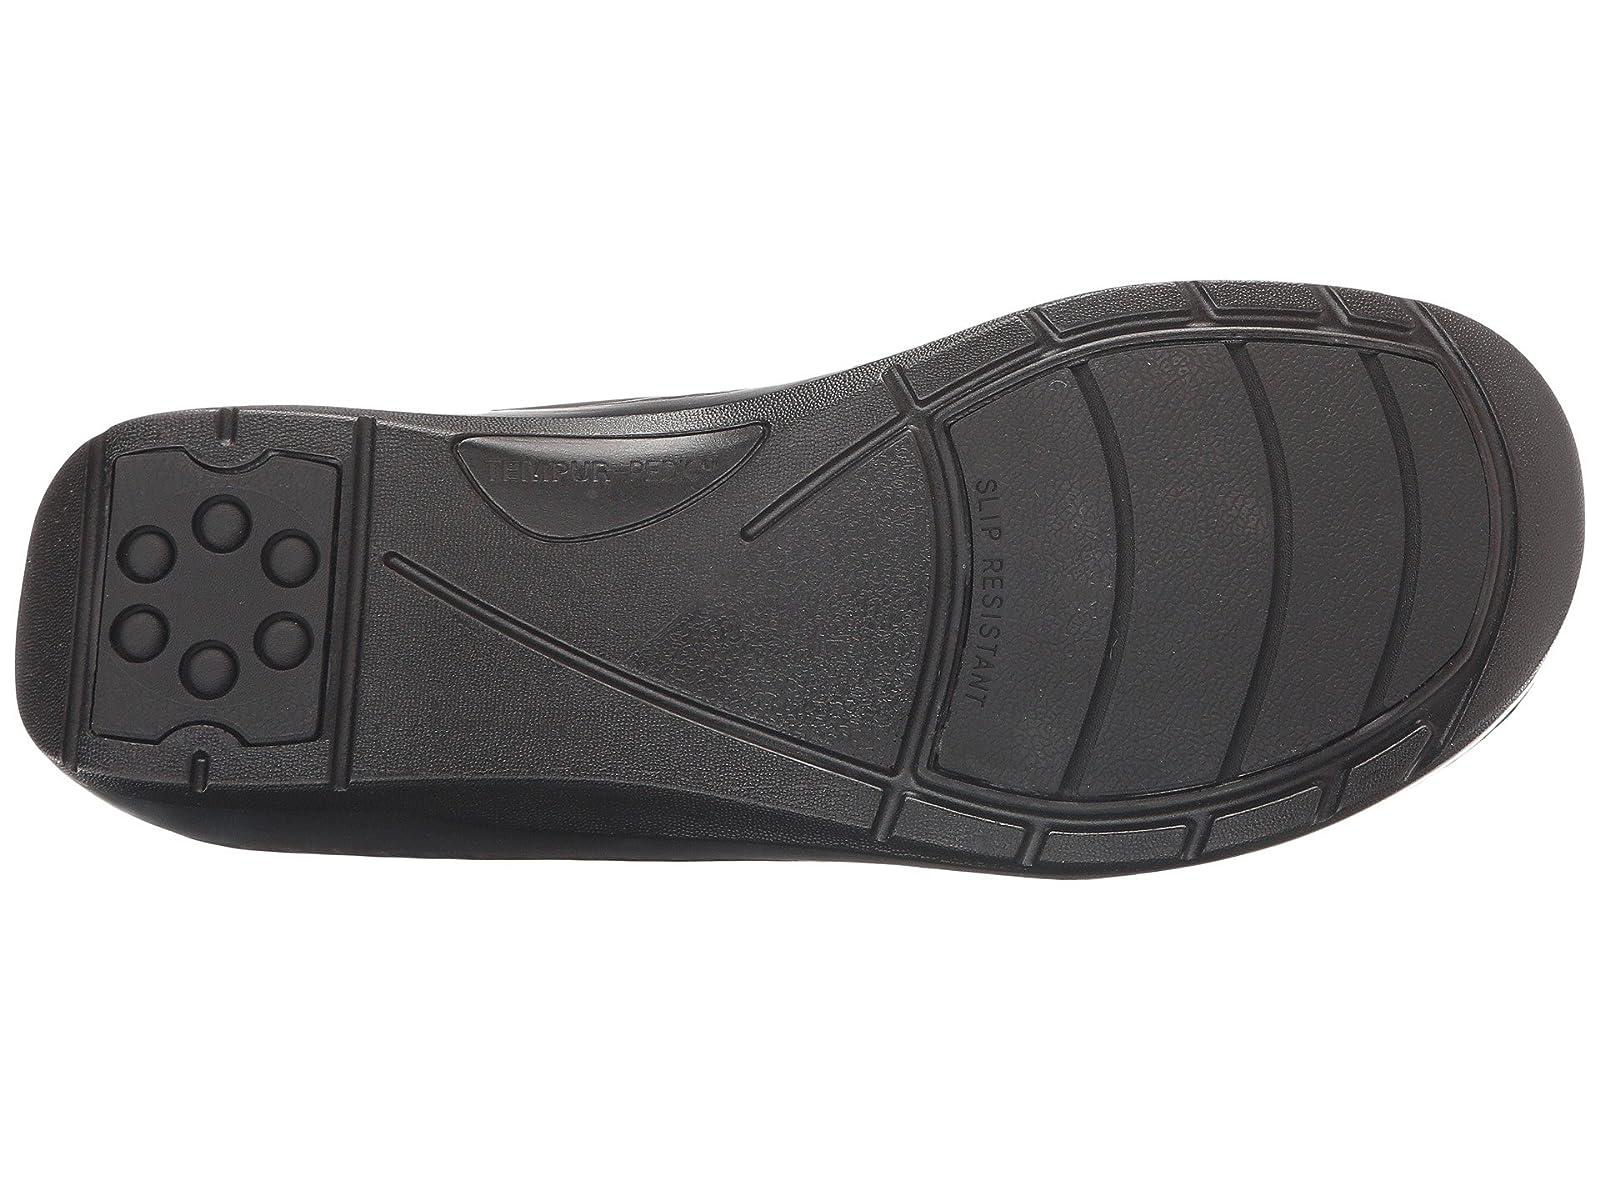 Gentlemen/Ladies Tempur-Pedic Darla Darla Darla  Modern Fashion 8de03f